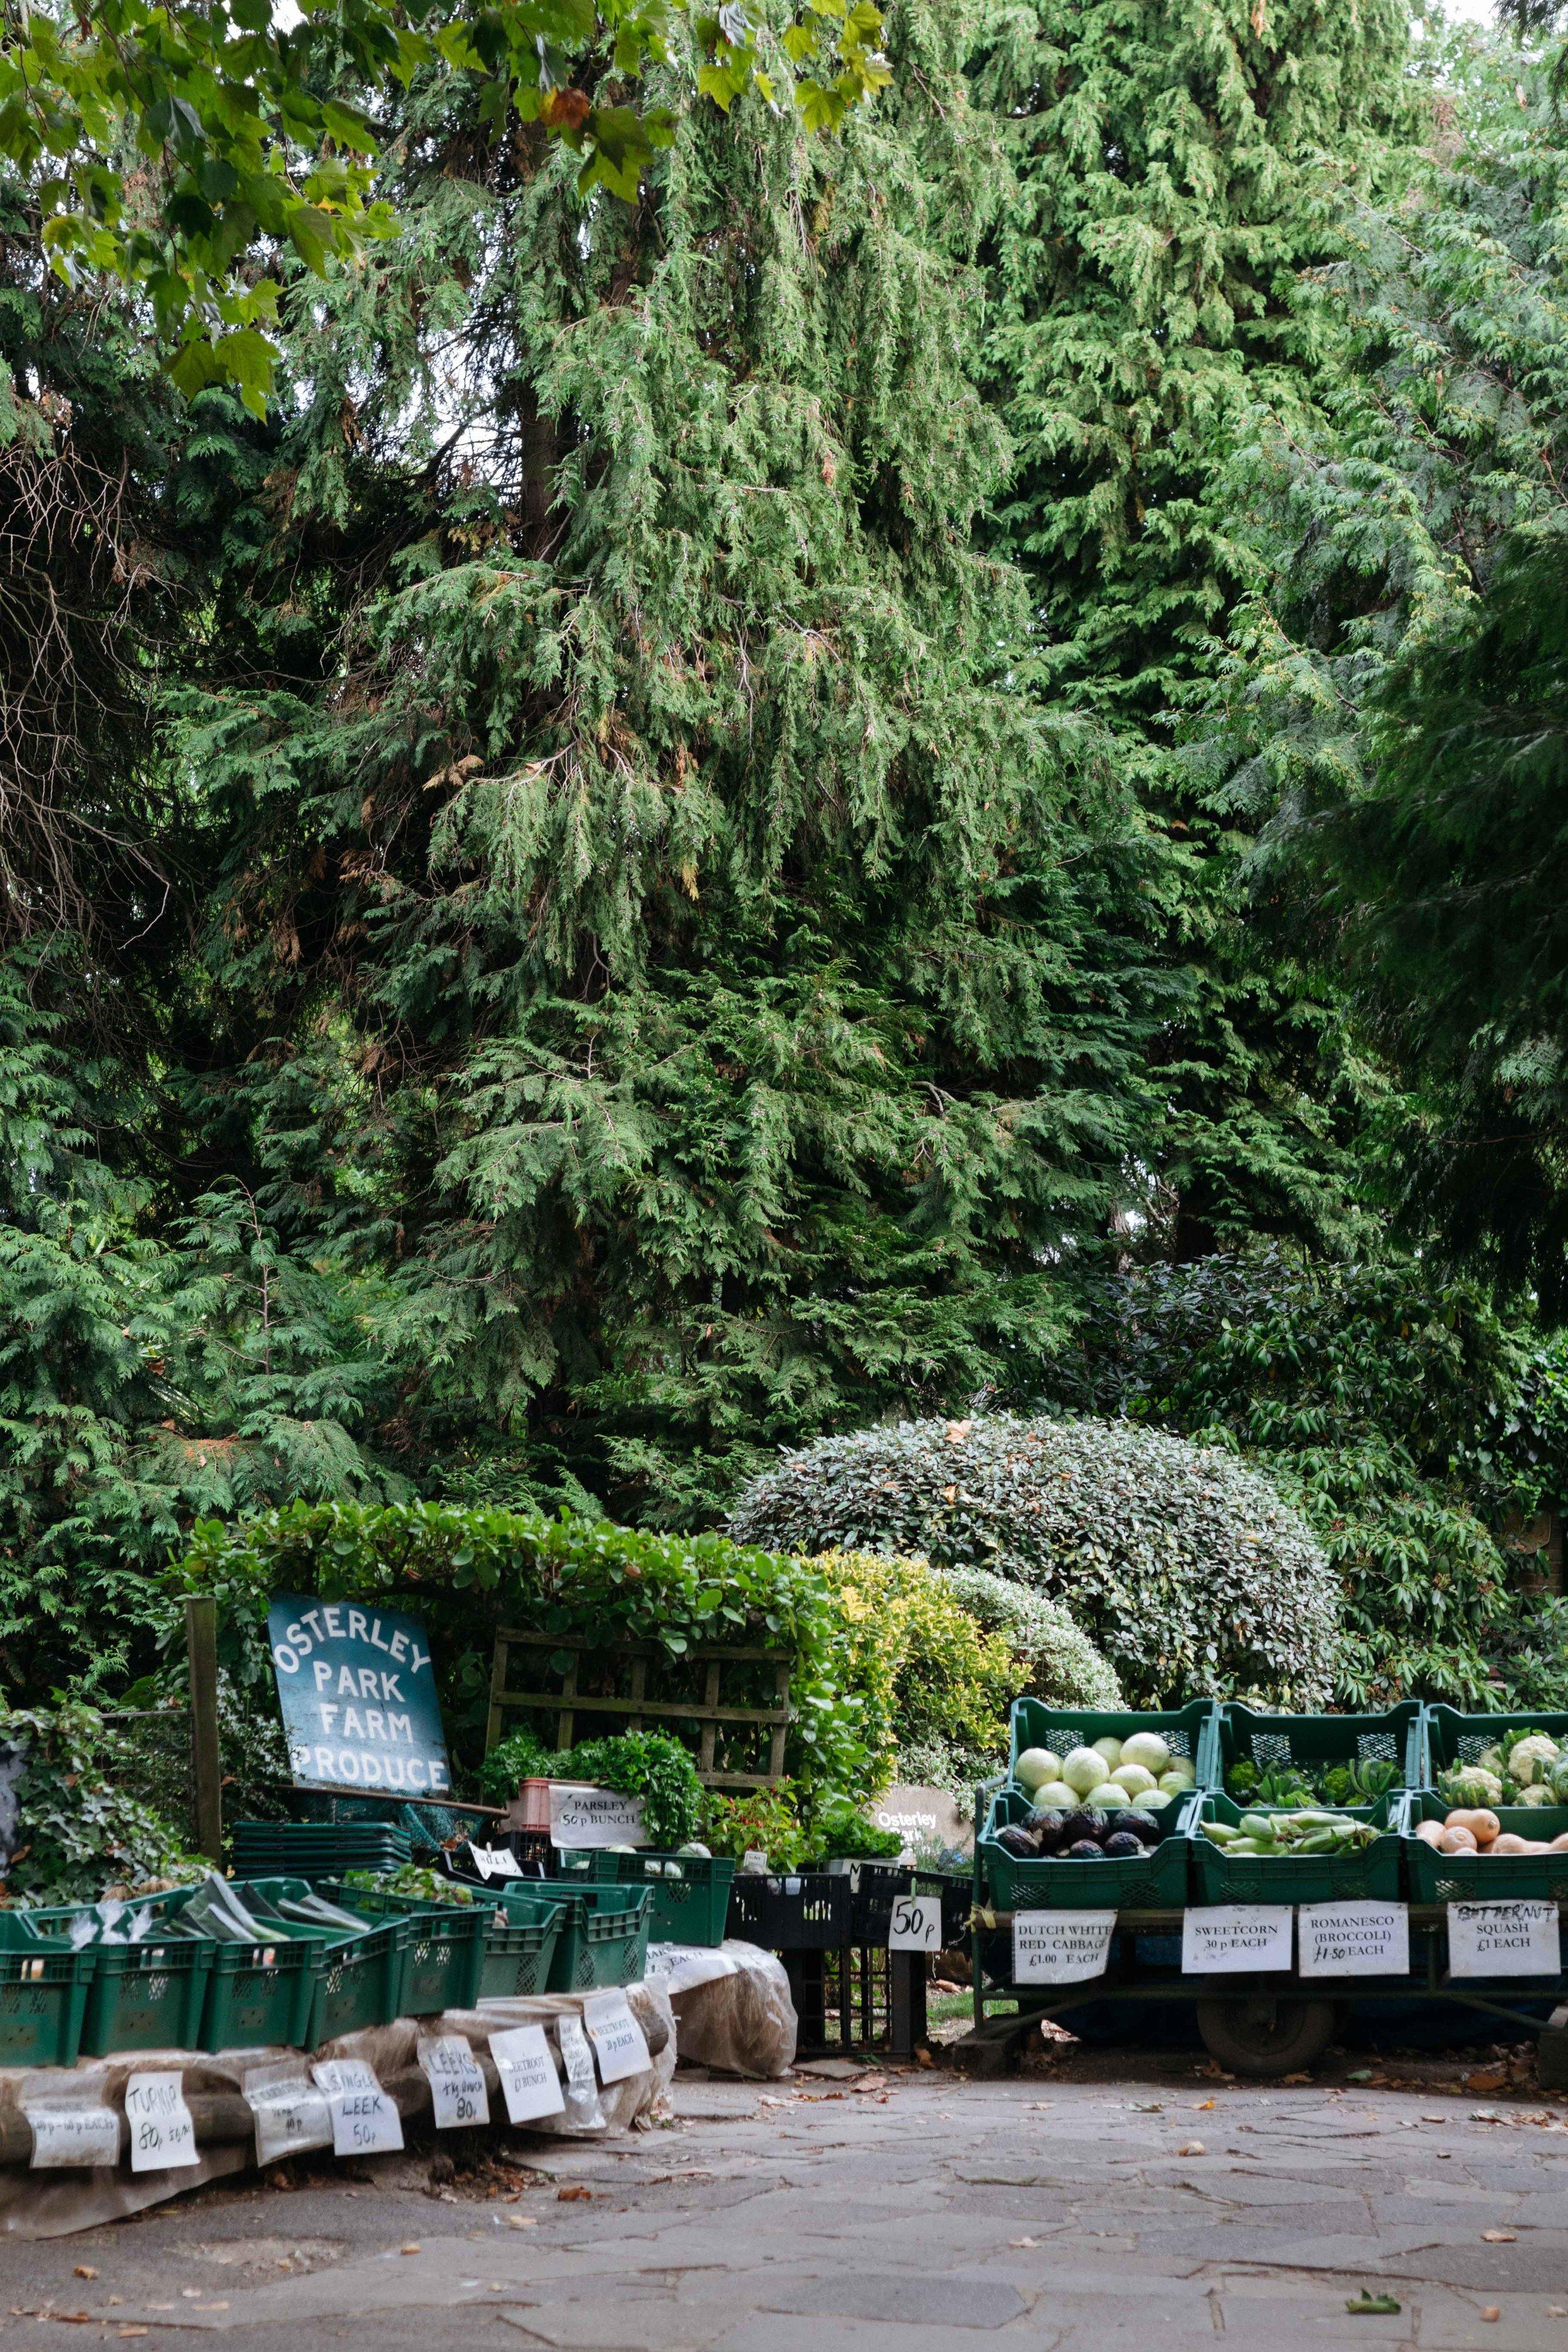 Osterley Park-3.jpg